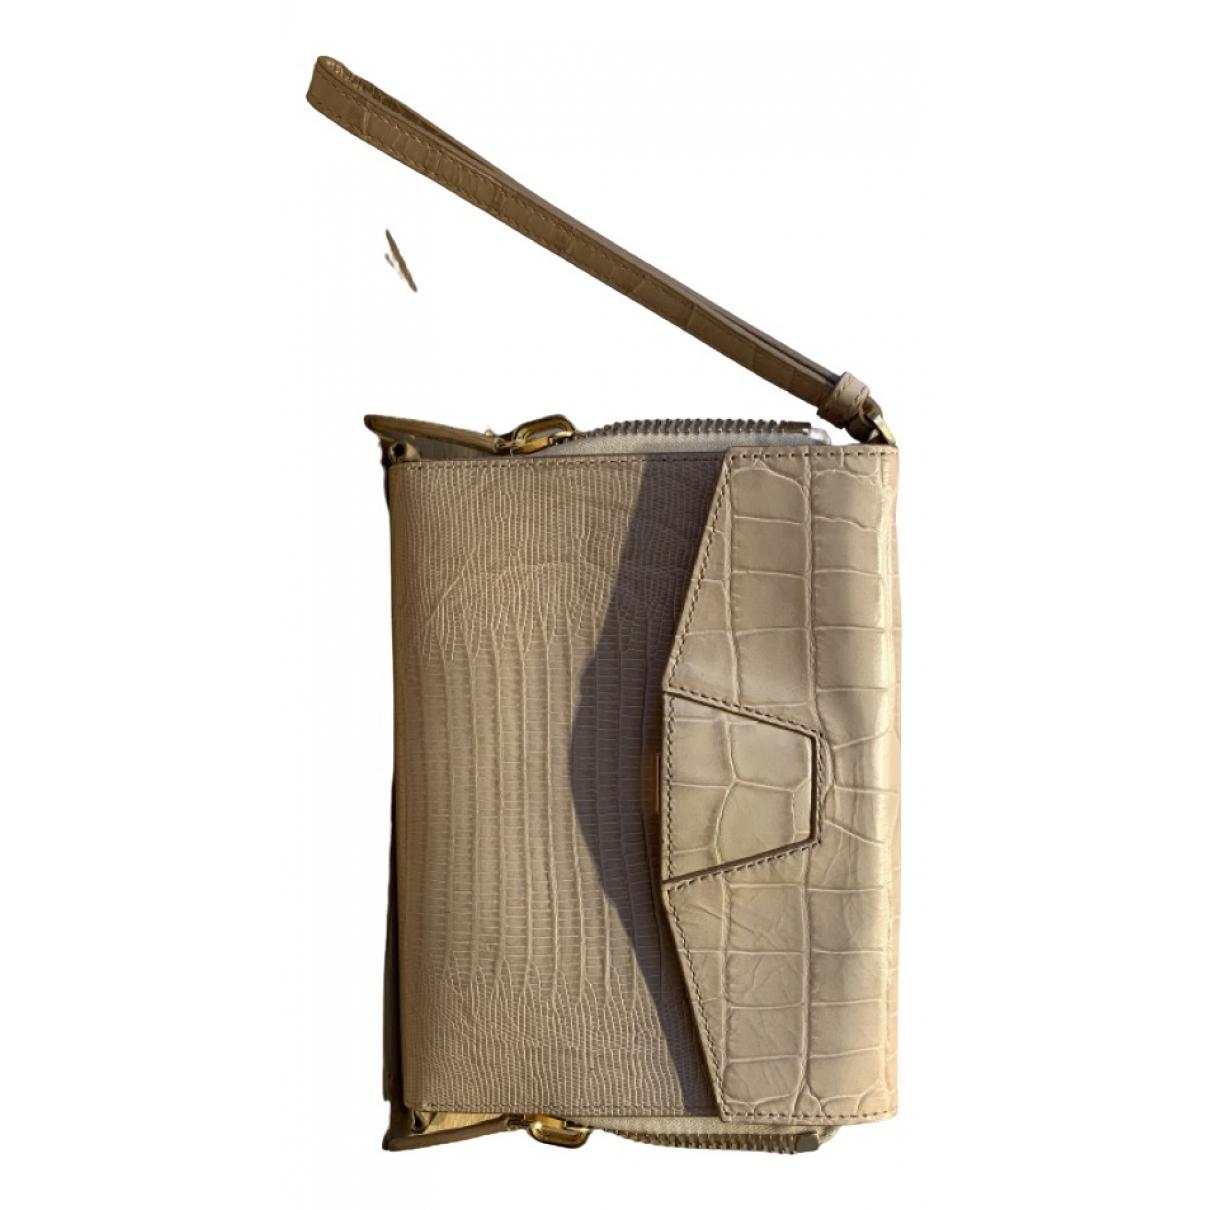 Alexander Wang N Beige Leather Clutch bag for Women N